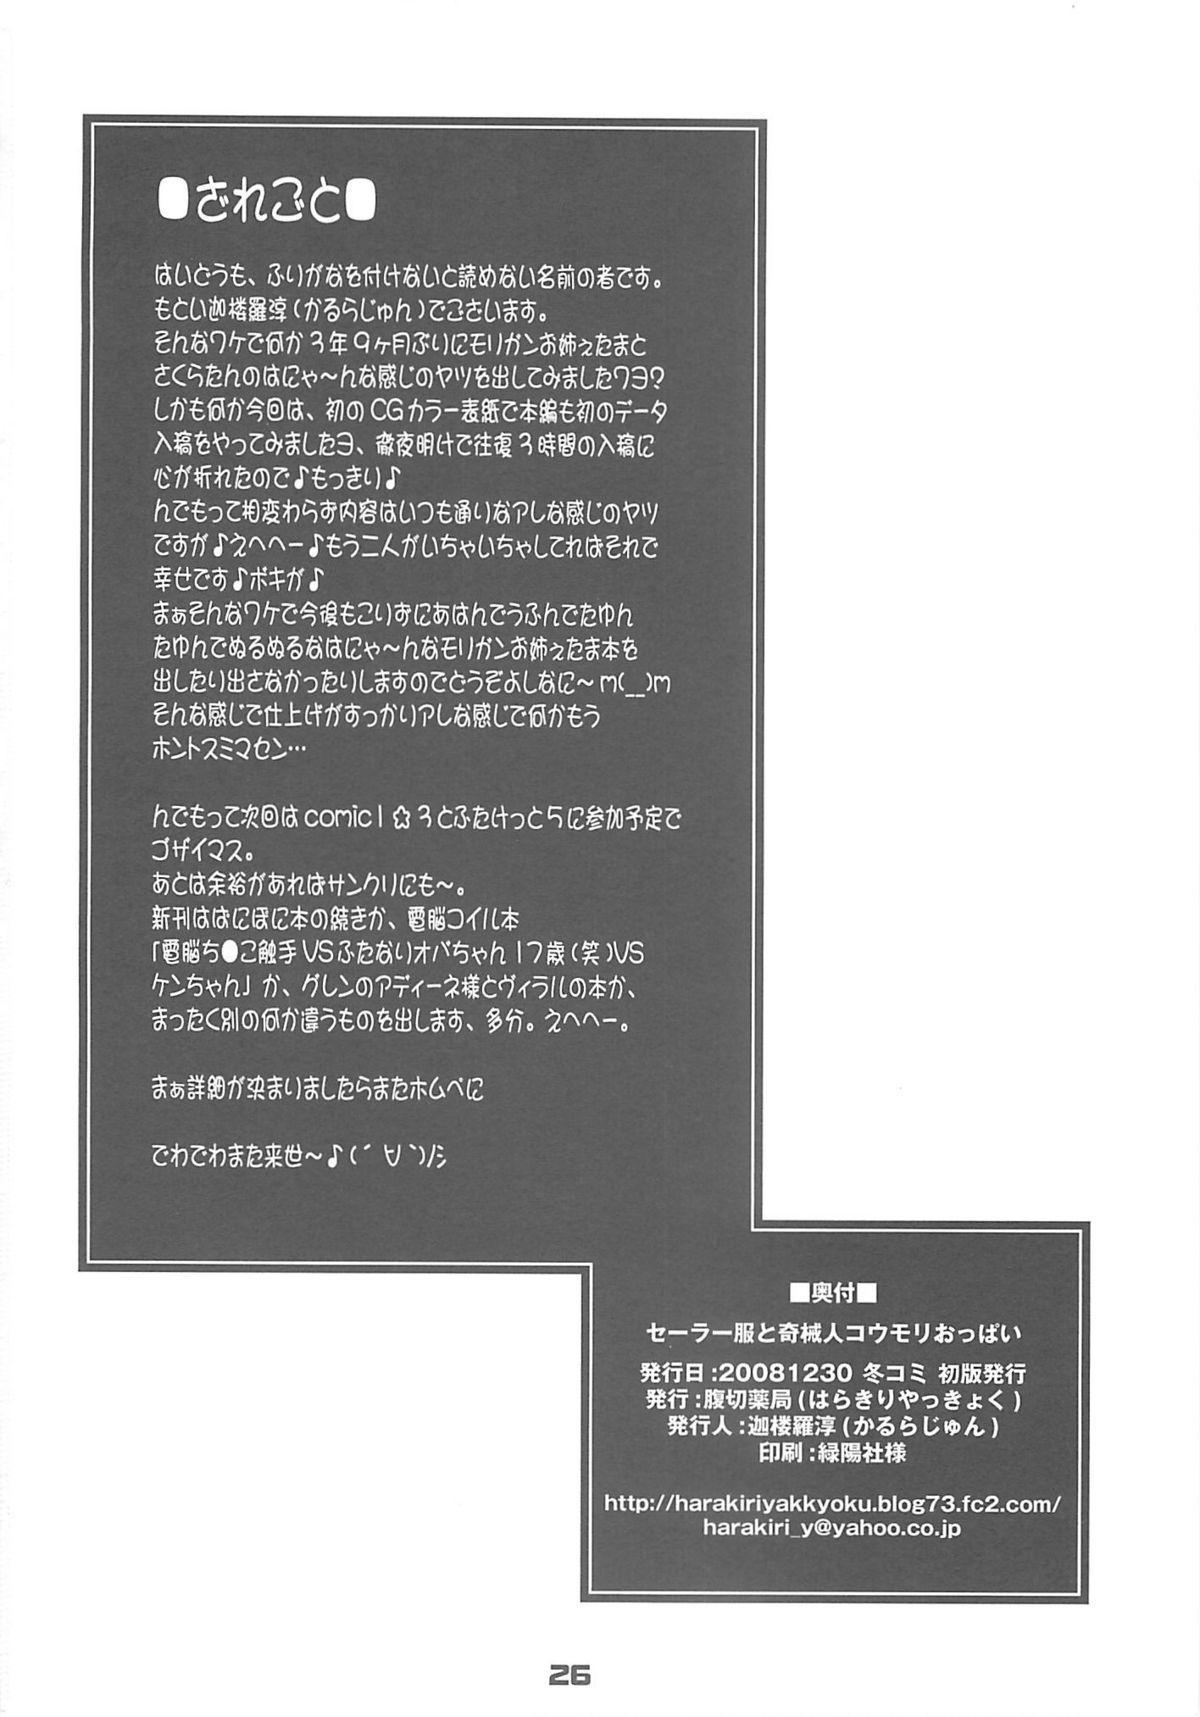 Sailor fuku to Kikai jin Koumori Oppai   Sailor Suit & Vampire Tits! 25